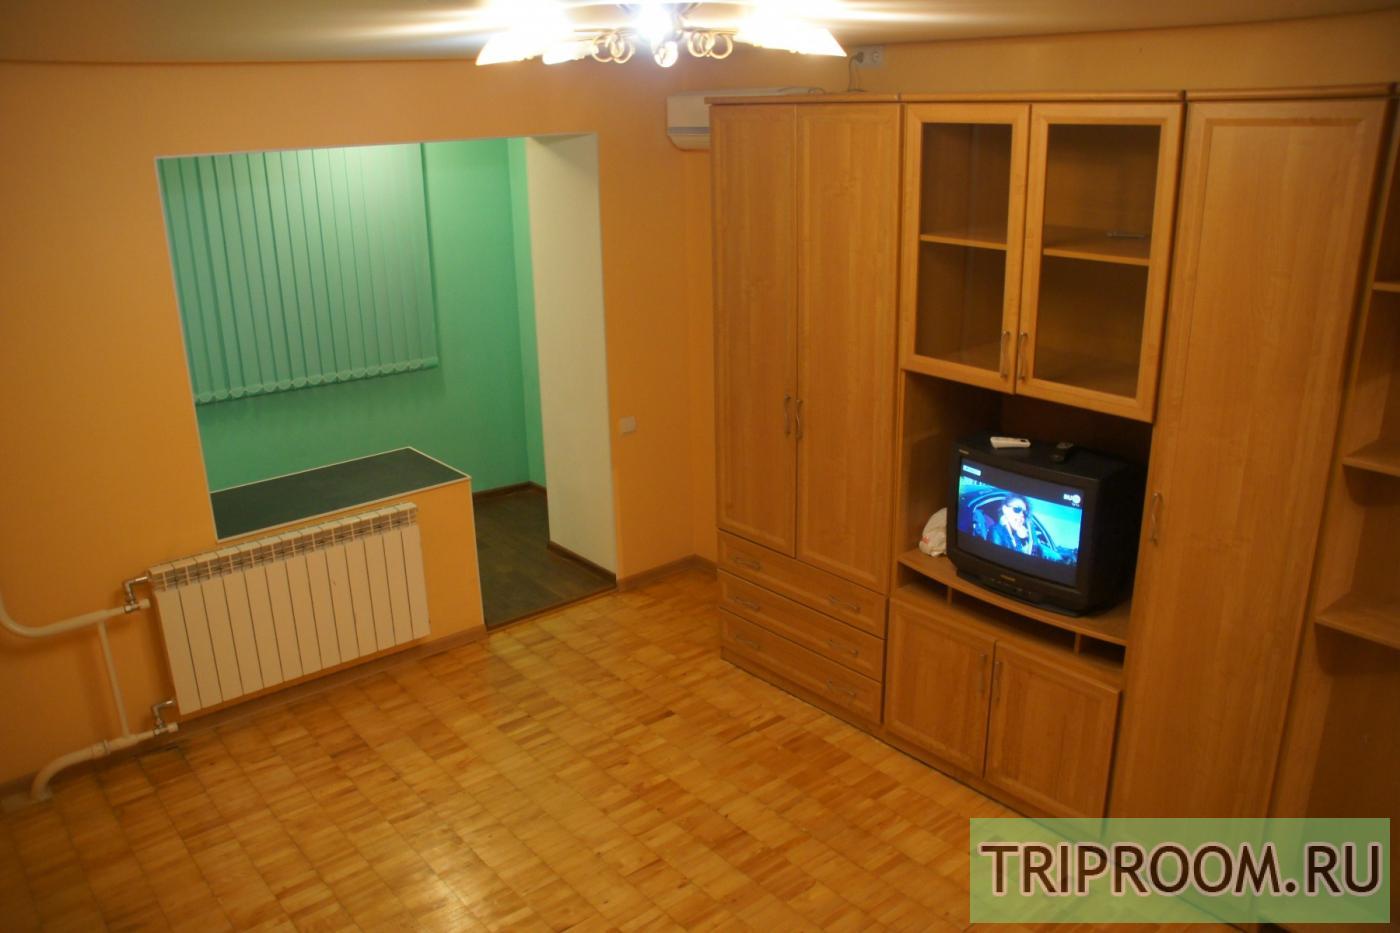 1-комнатная квартира посуточно (вариант № 30339), ул. Пархоменко улица, фото № 1